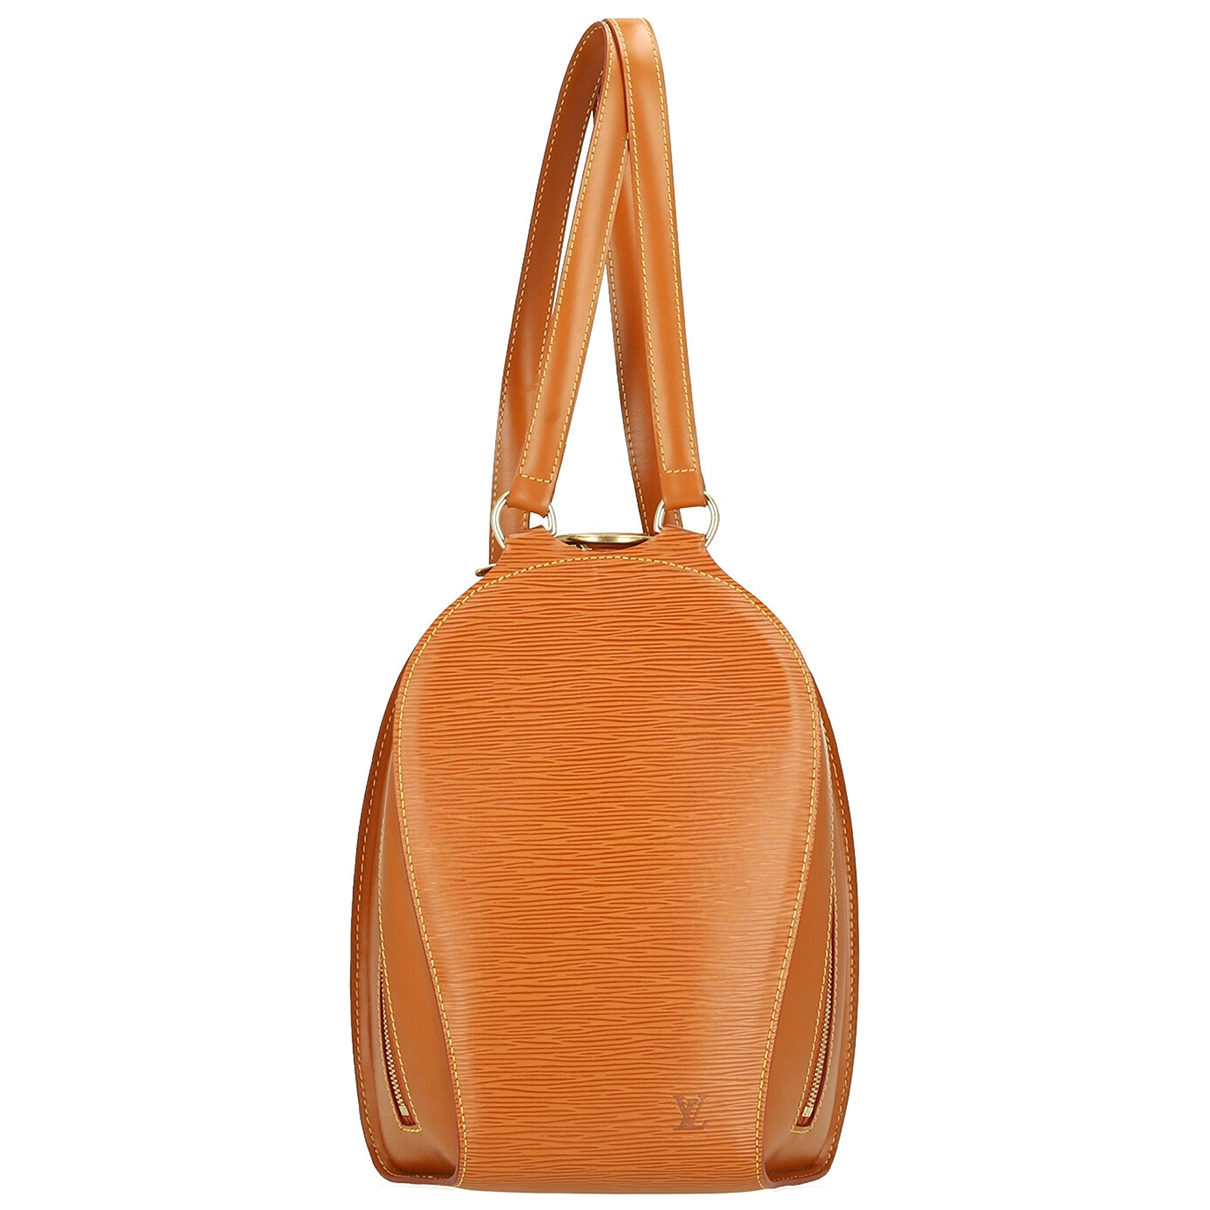 Louis Vuitton \N Orange Leather handbag for Women \N